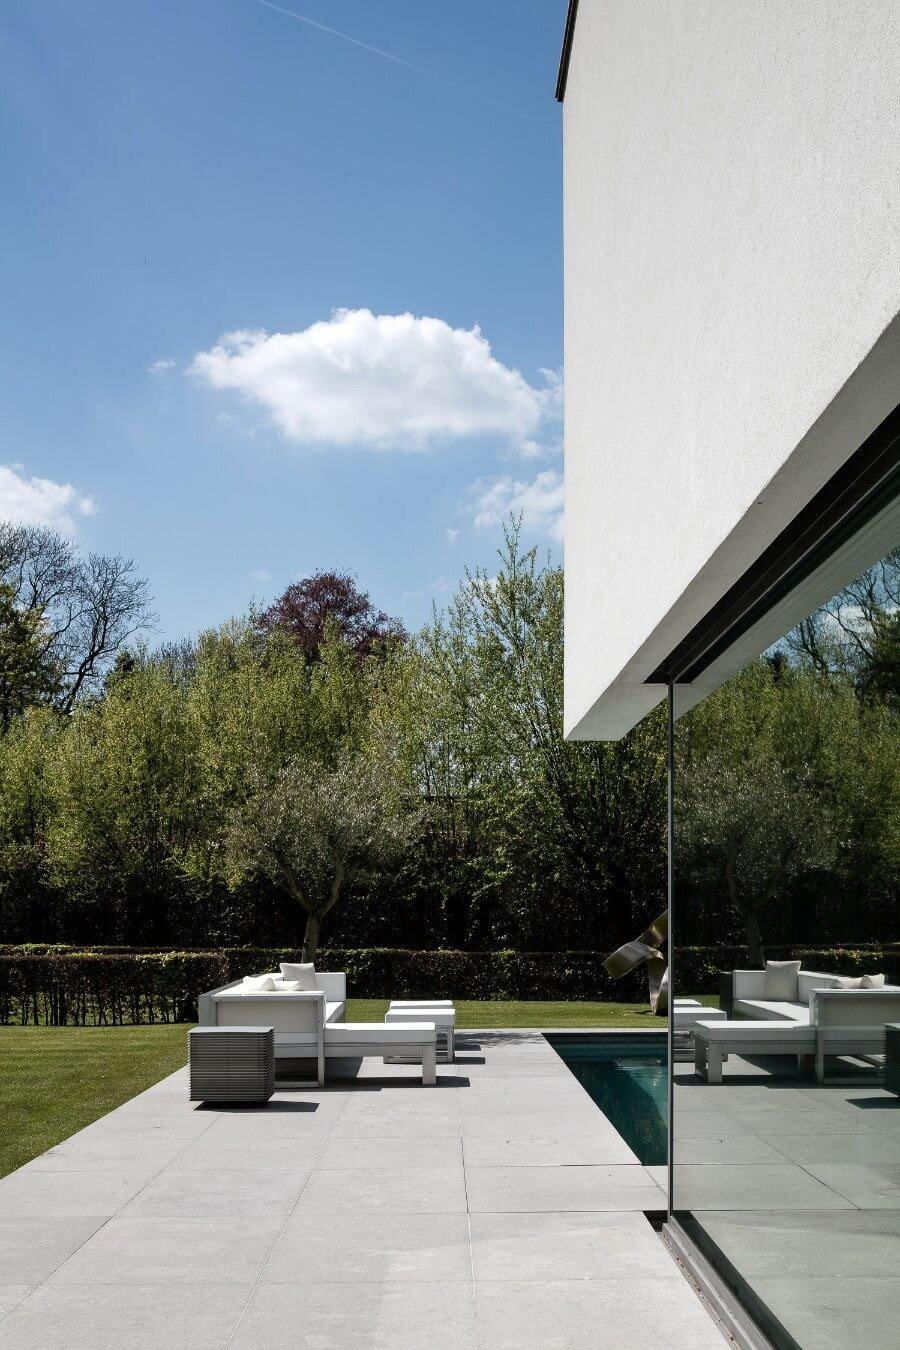 House-MP-Rietveldprojects-Photobycafeine-33